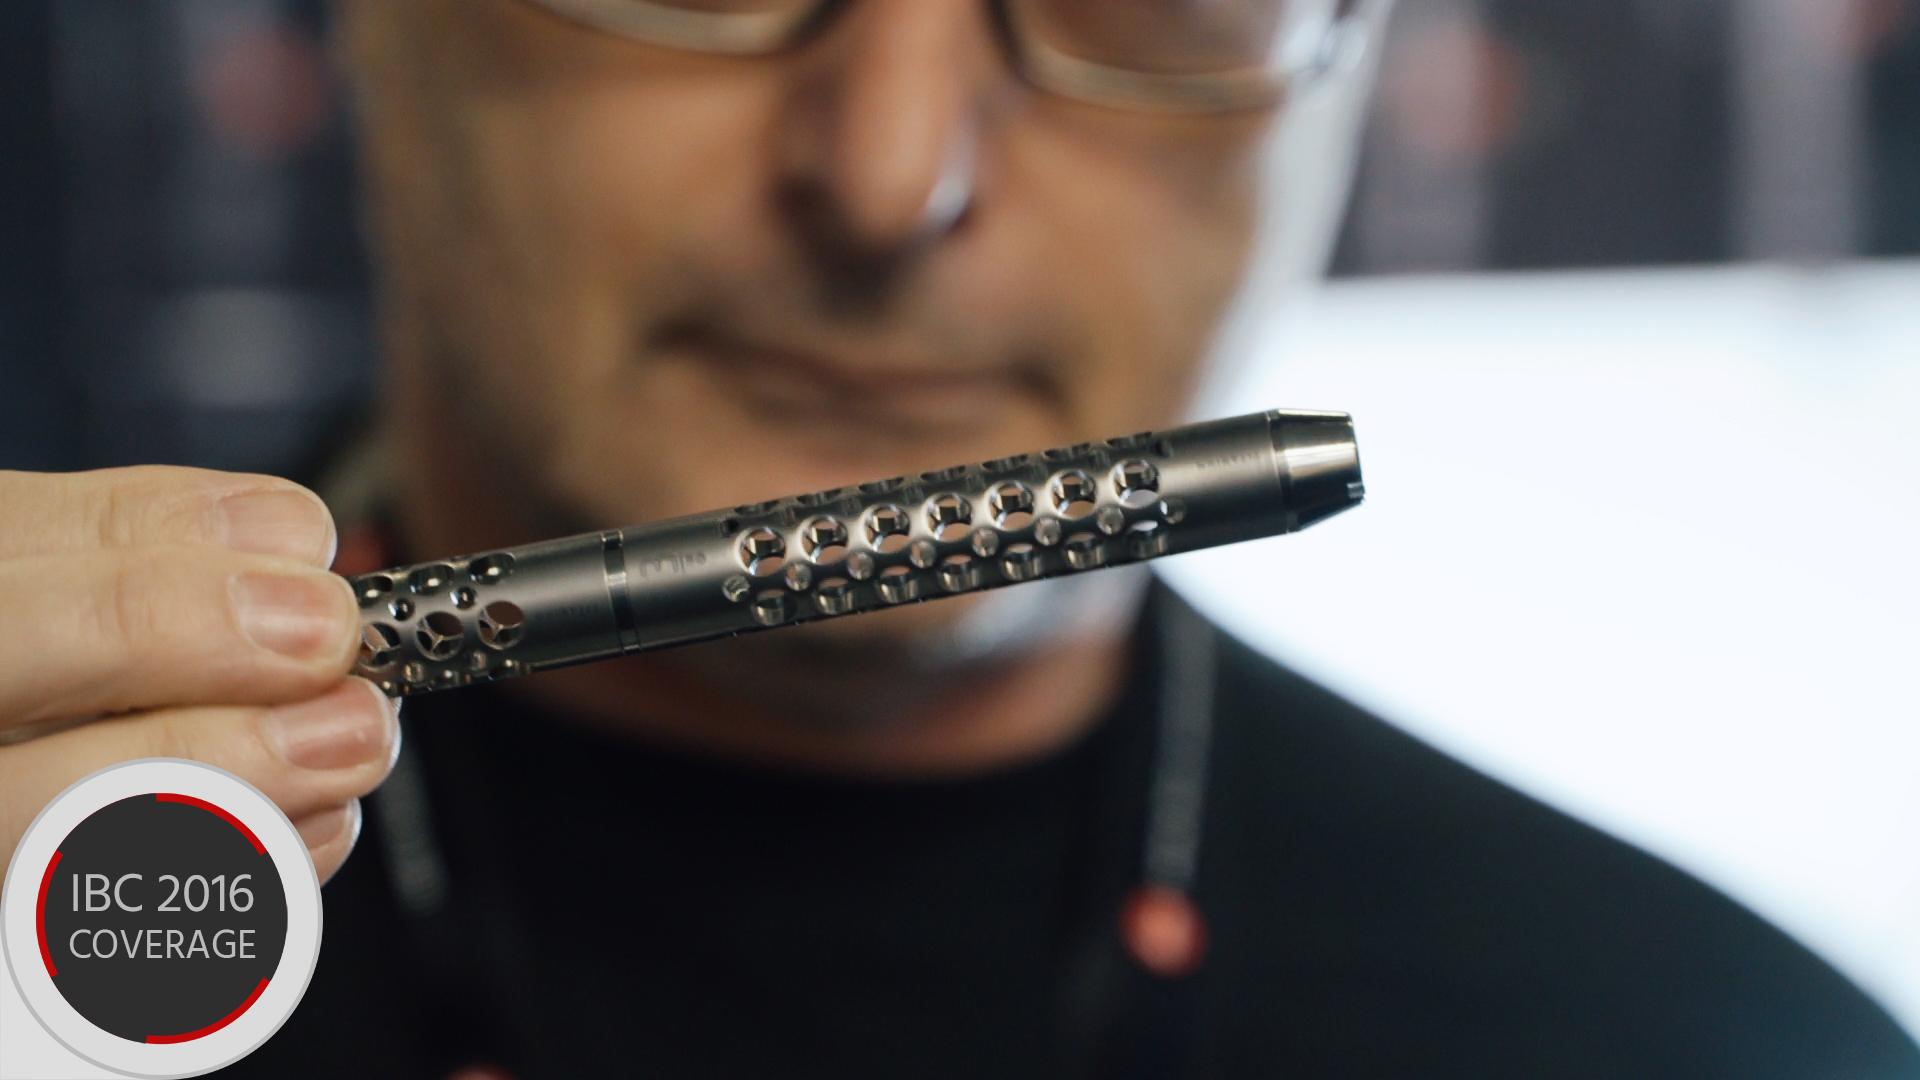 LockCircleがRodRocketを発表 - 軽量で自由度の高いロッドバー